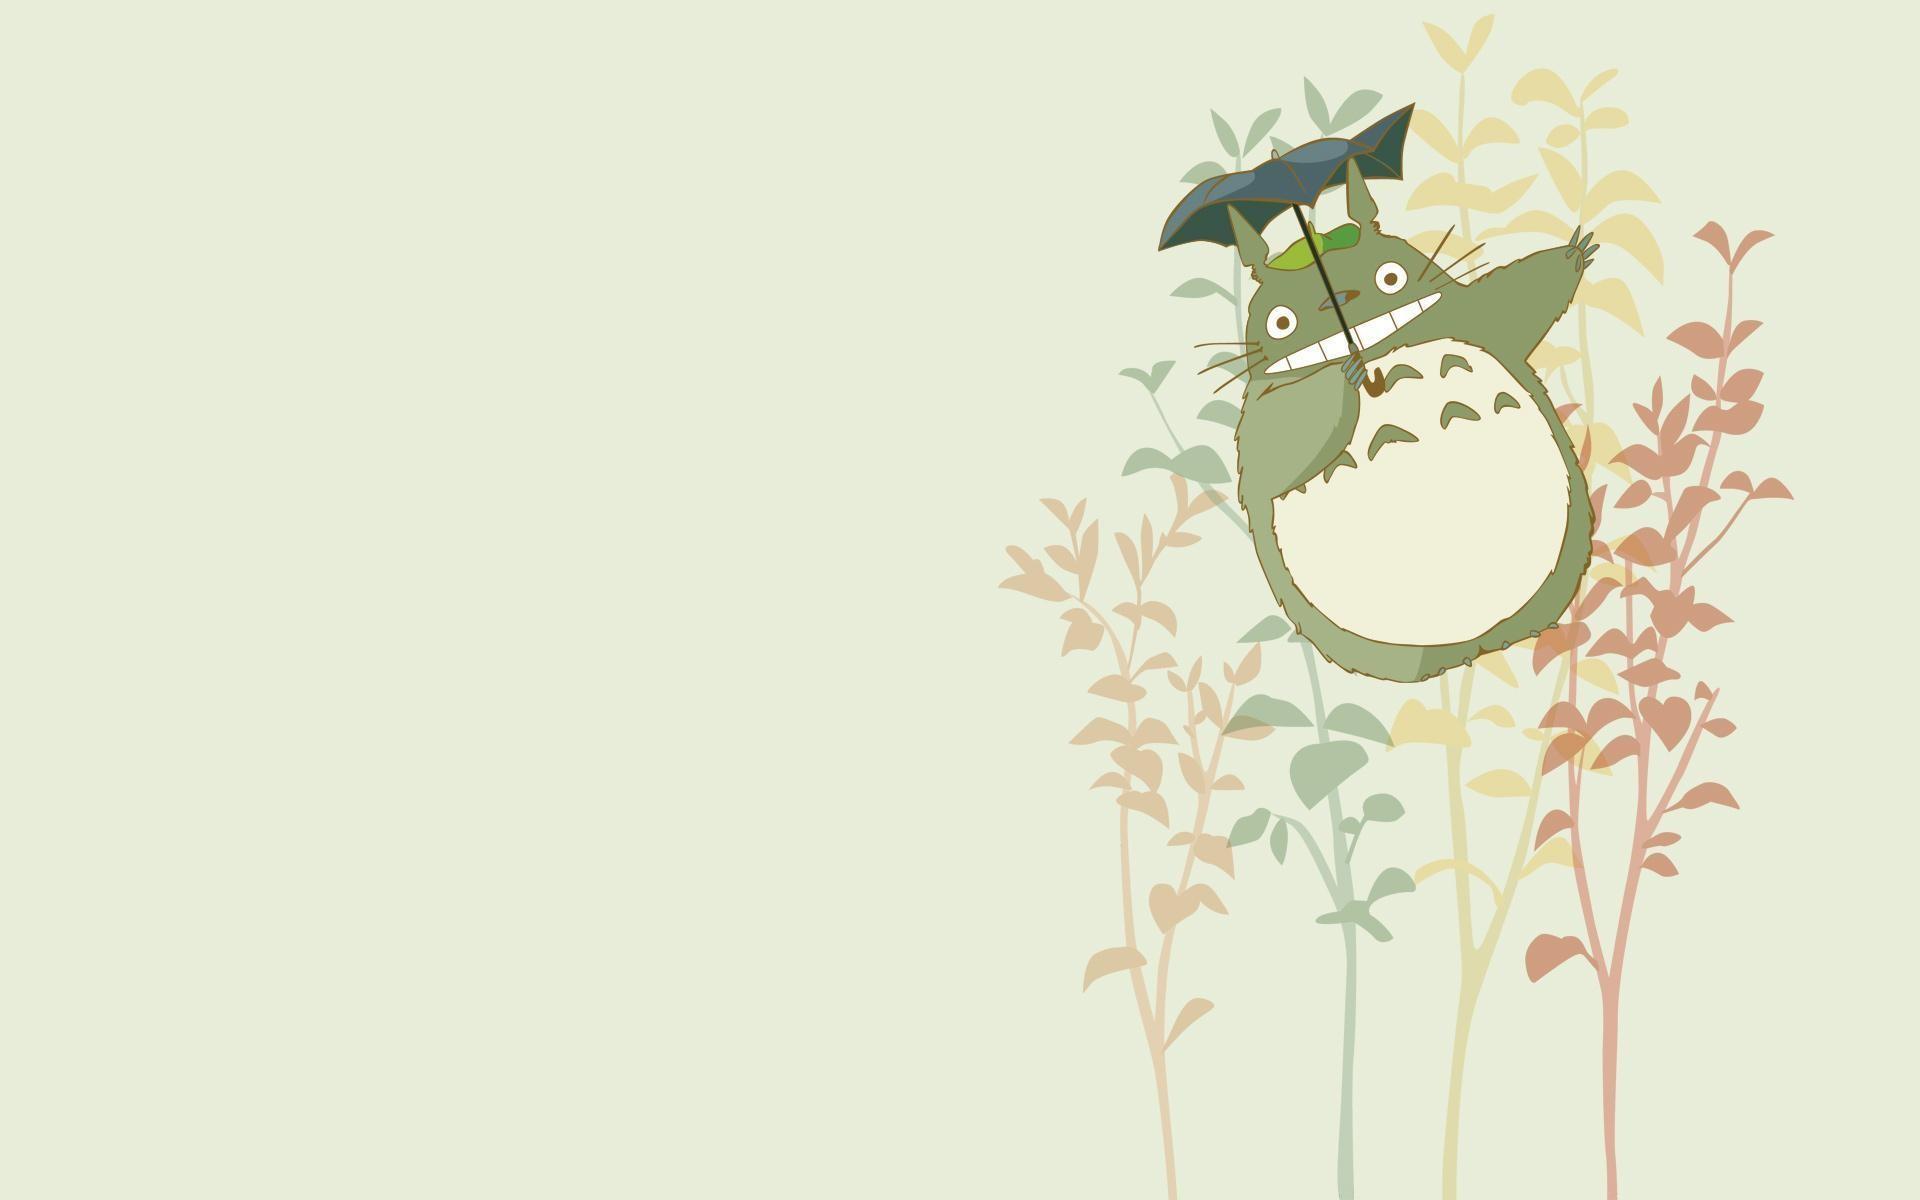 My Neighbor Totoro WallPaper HD – IMASHON.COM